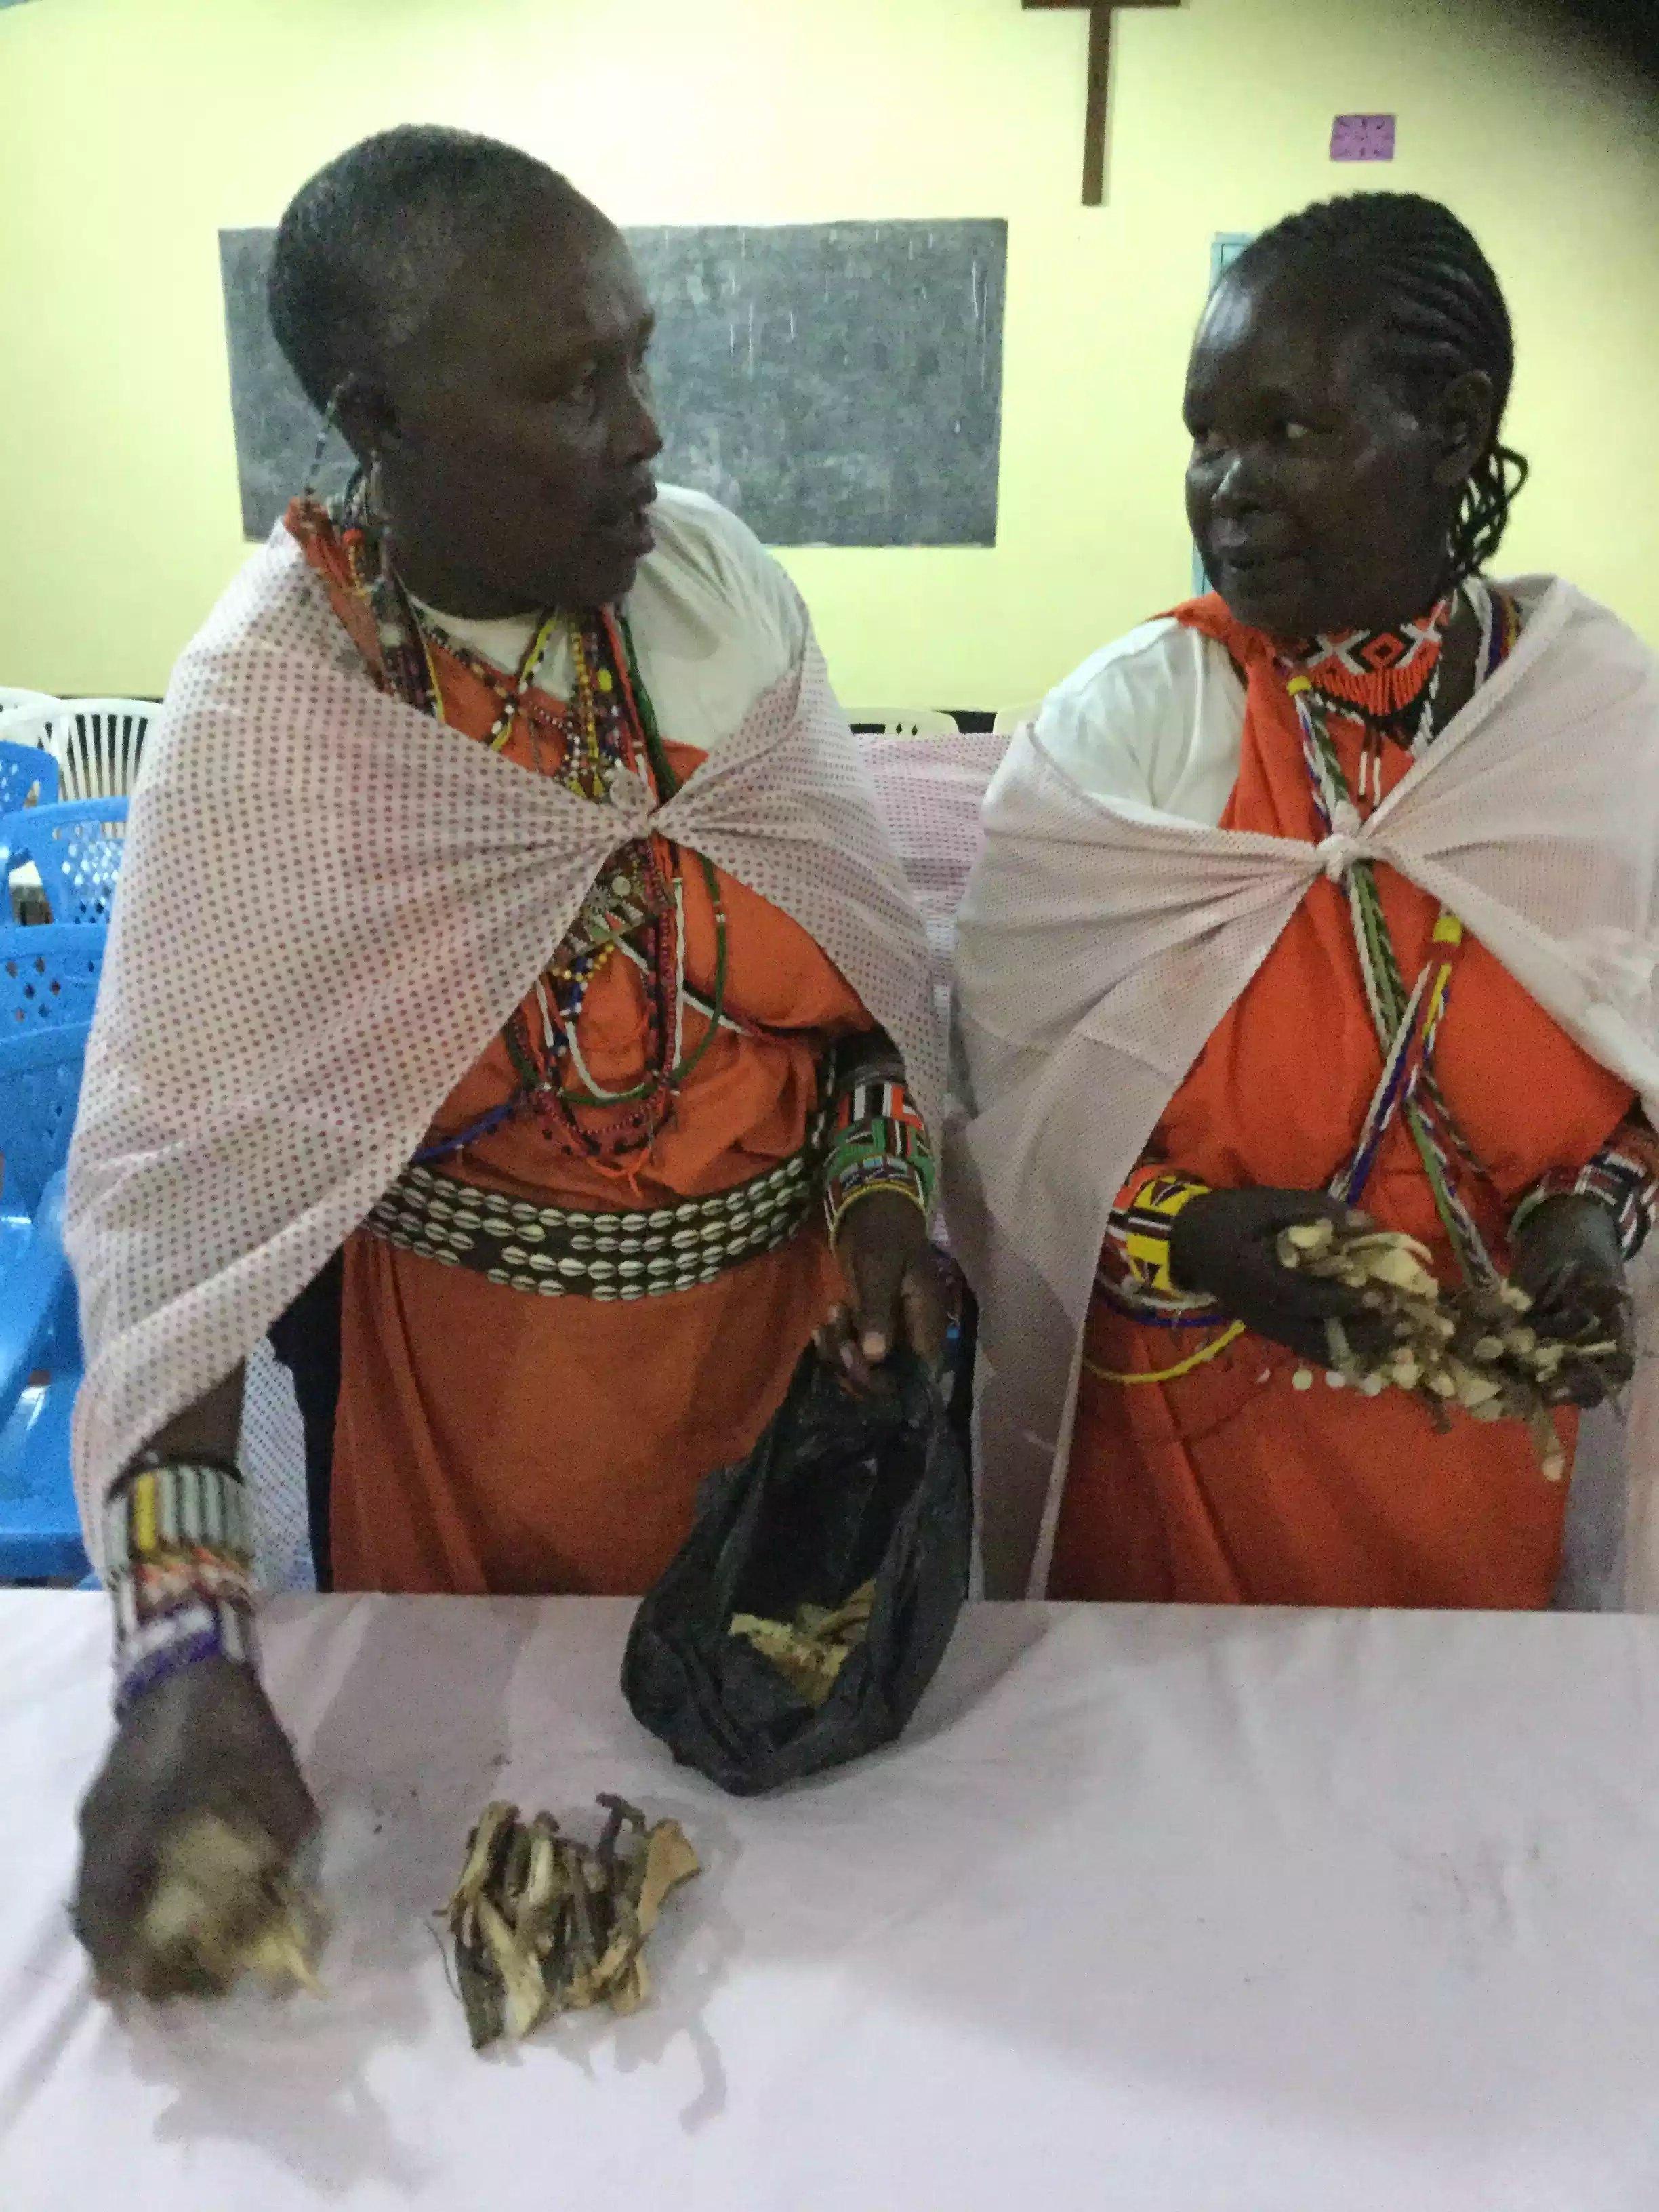 http://indigenouswomen-africa.org/wp-content/uploads/2018/03/image-33660.jpeg